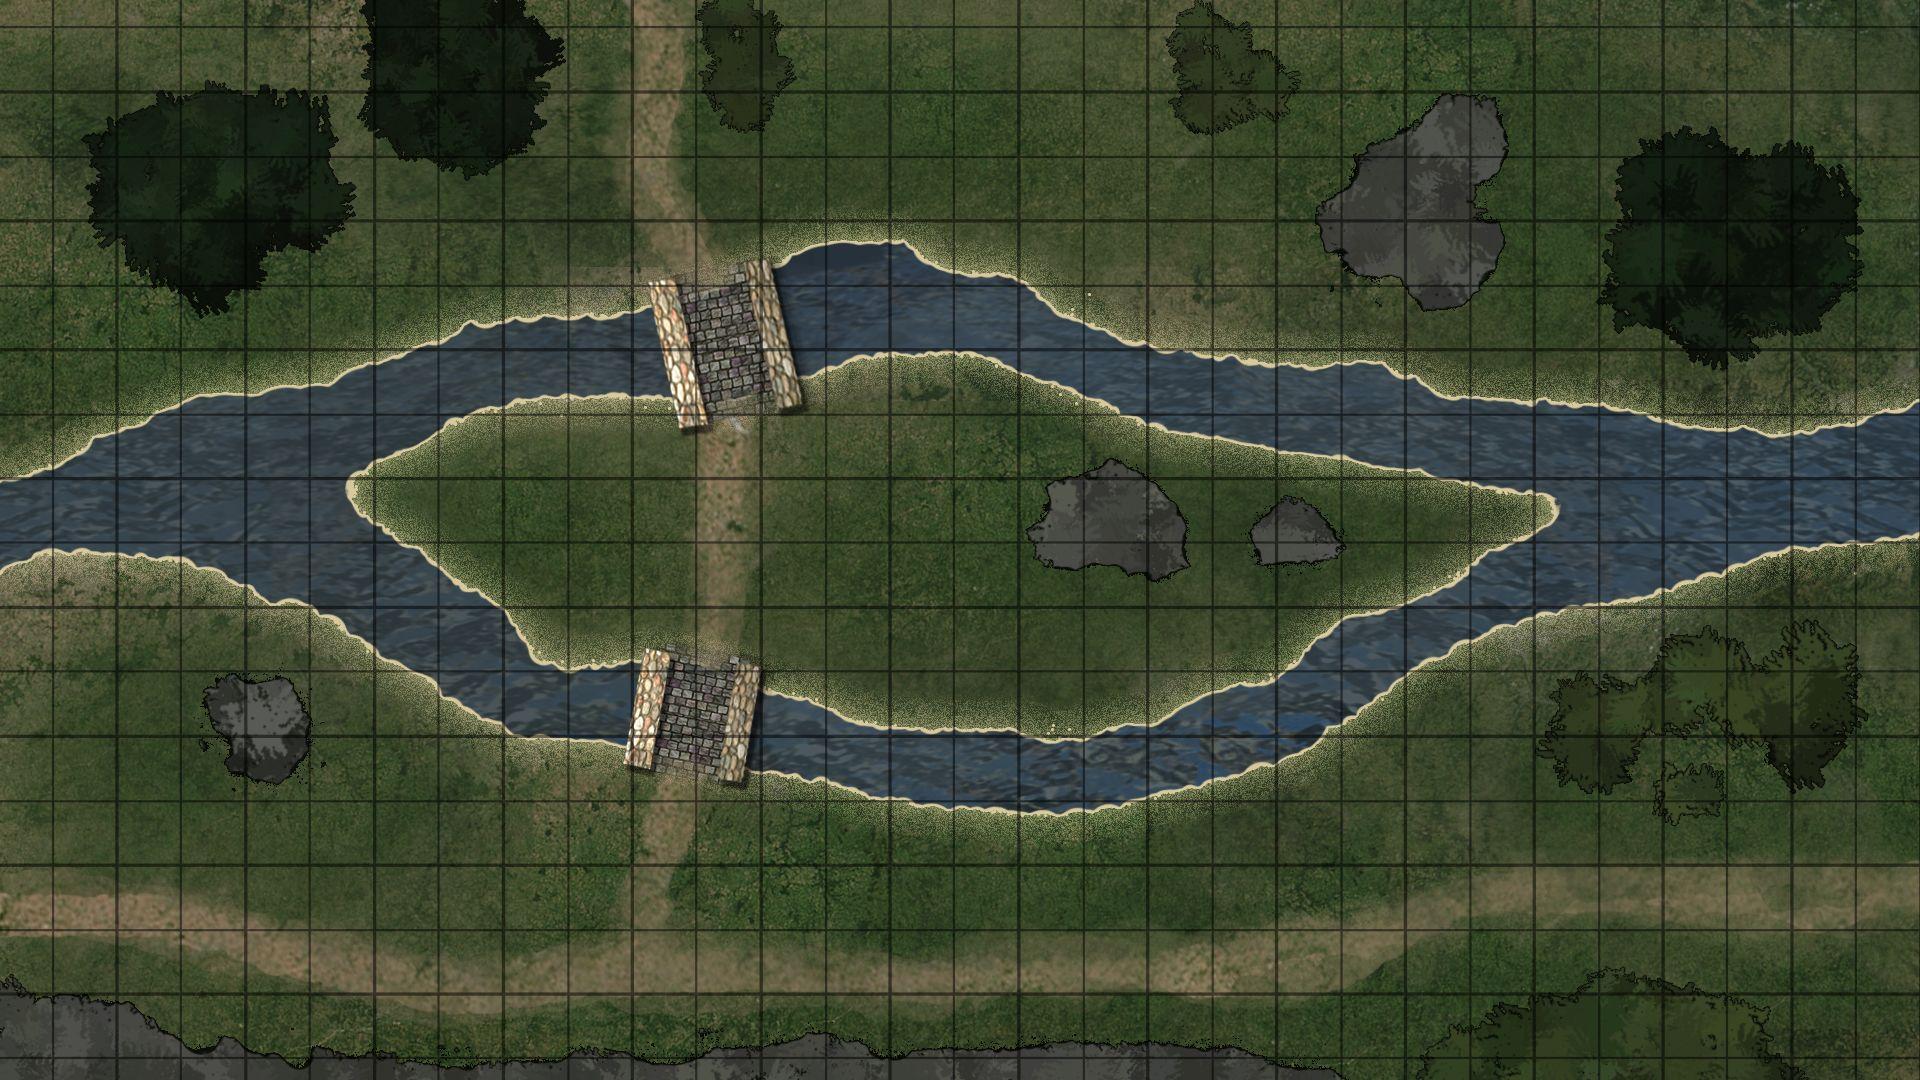 ambush-road.jpg (1920×1080)